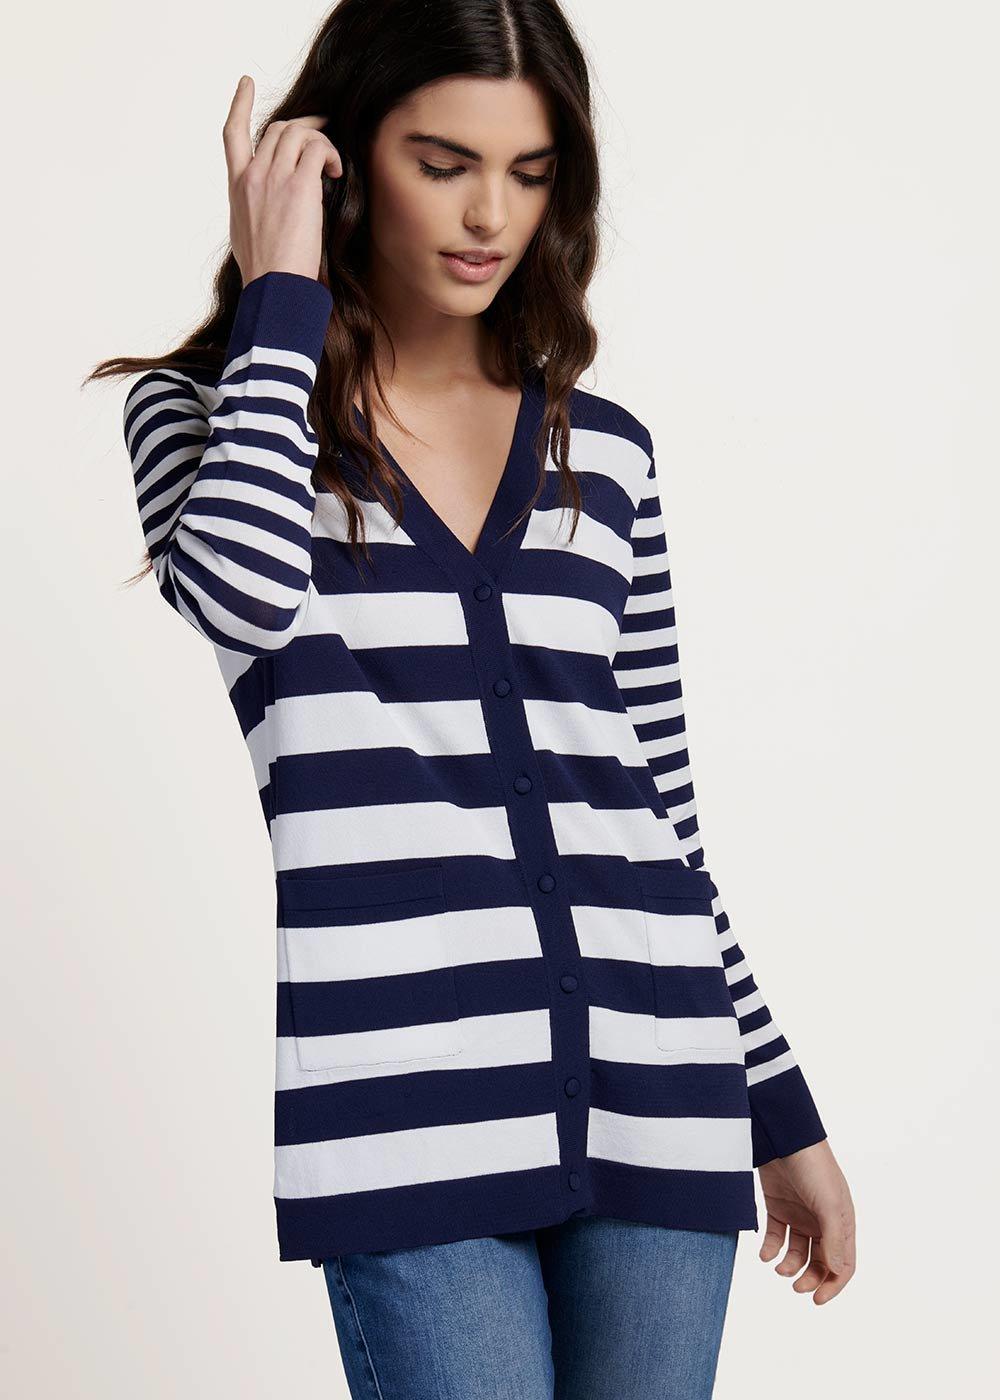 Casey cardigan with white&blue stripes - M.blue / White / Stripes - Woman